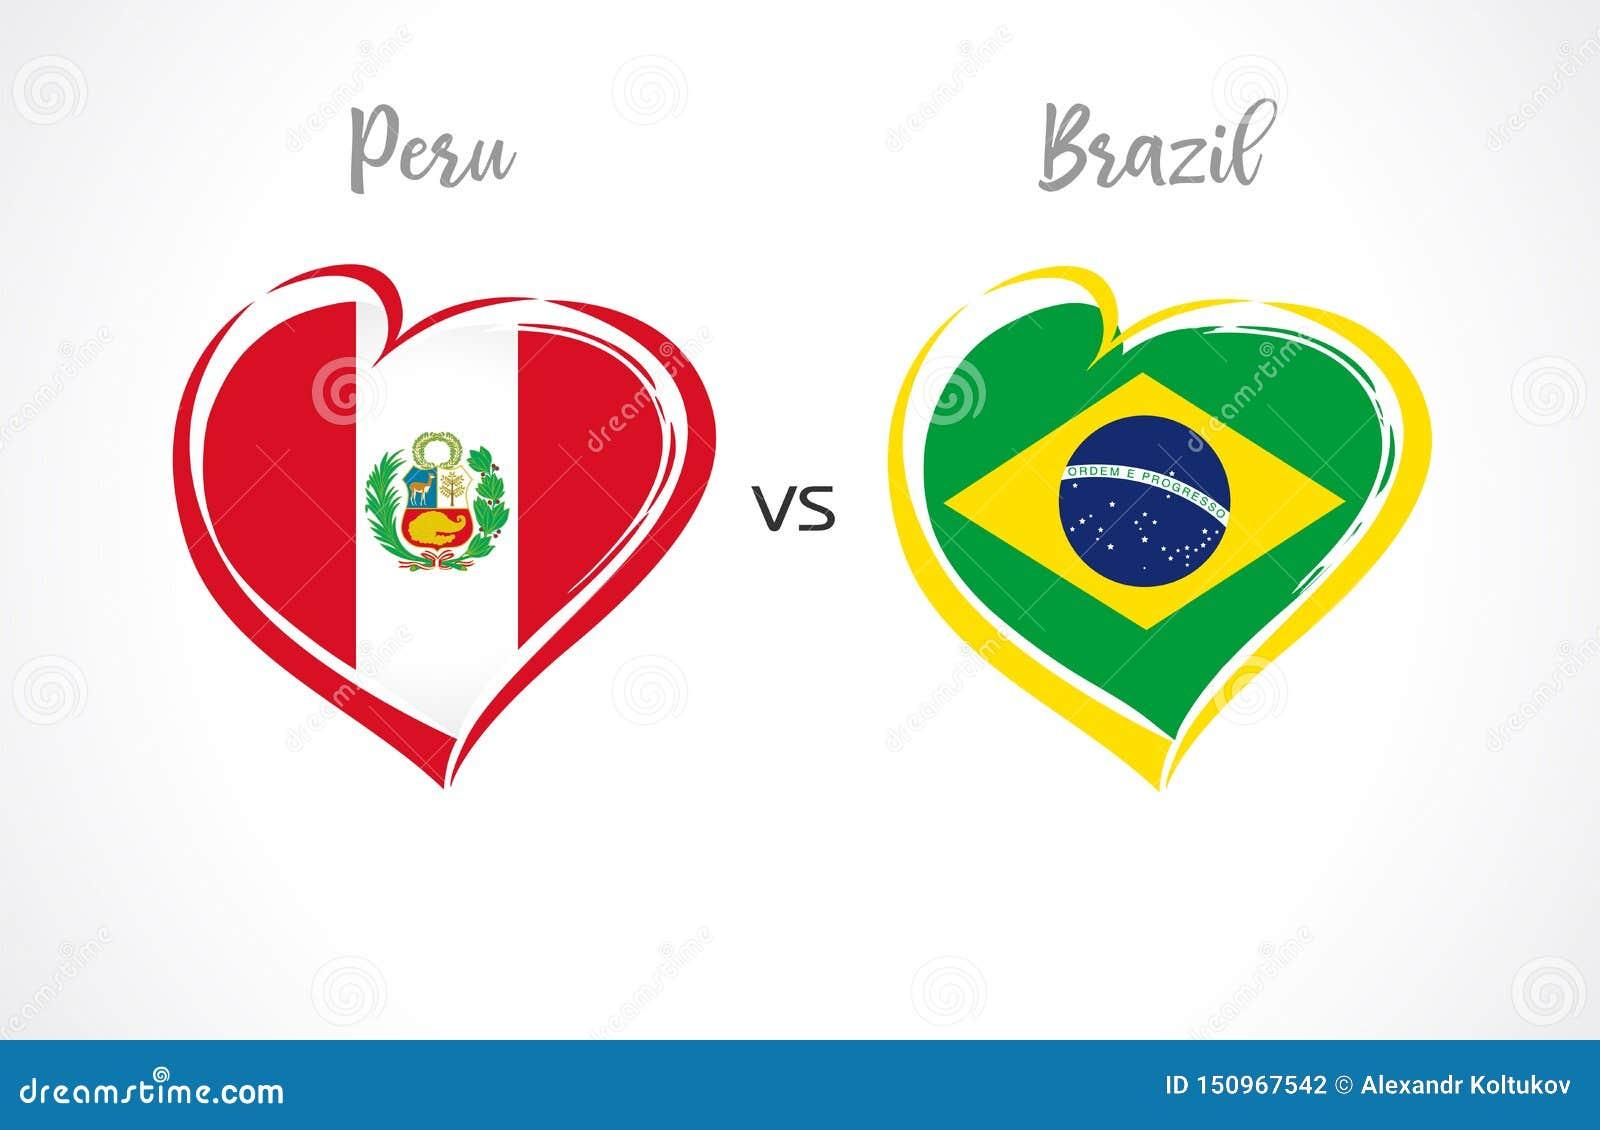 Peru vs Brasilien, landslagfotbollflaggor på vit bakgrund